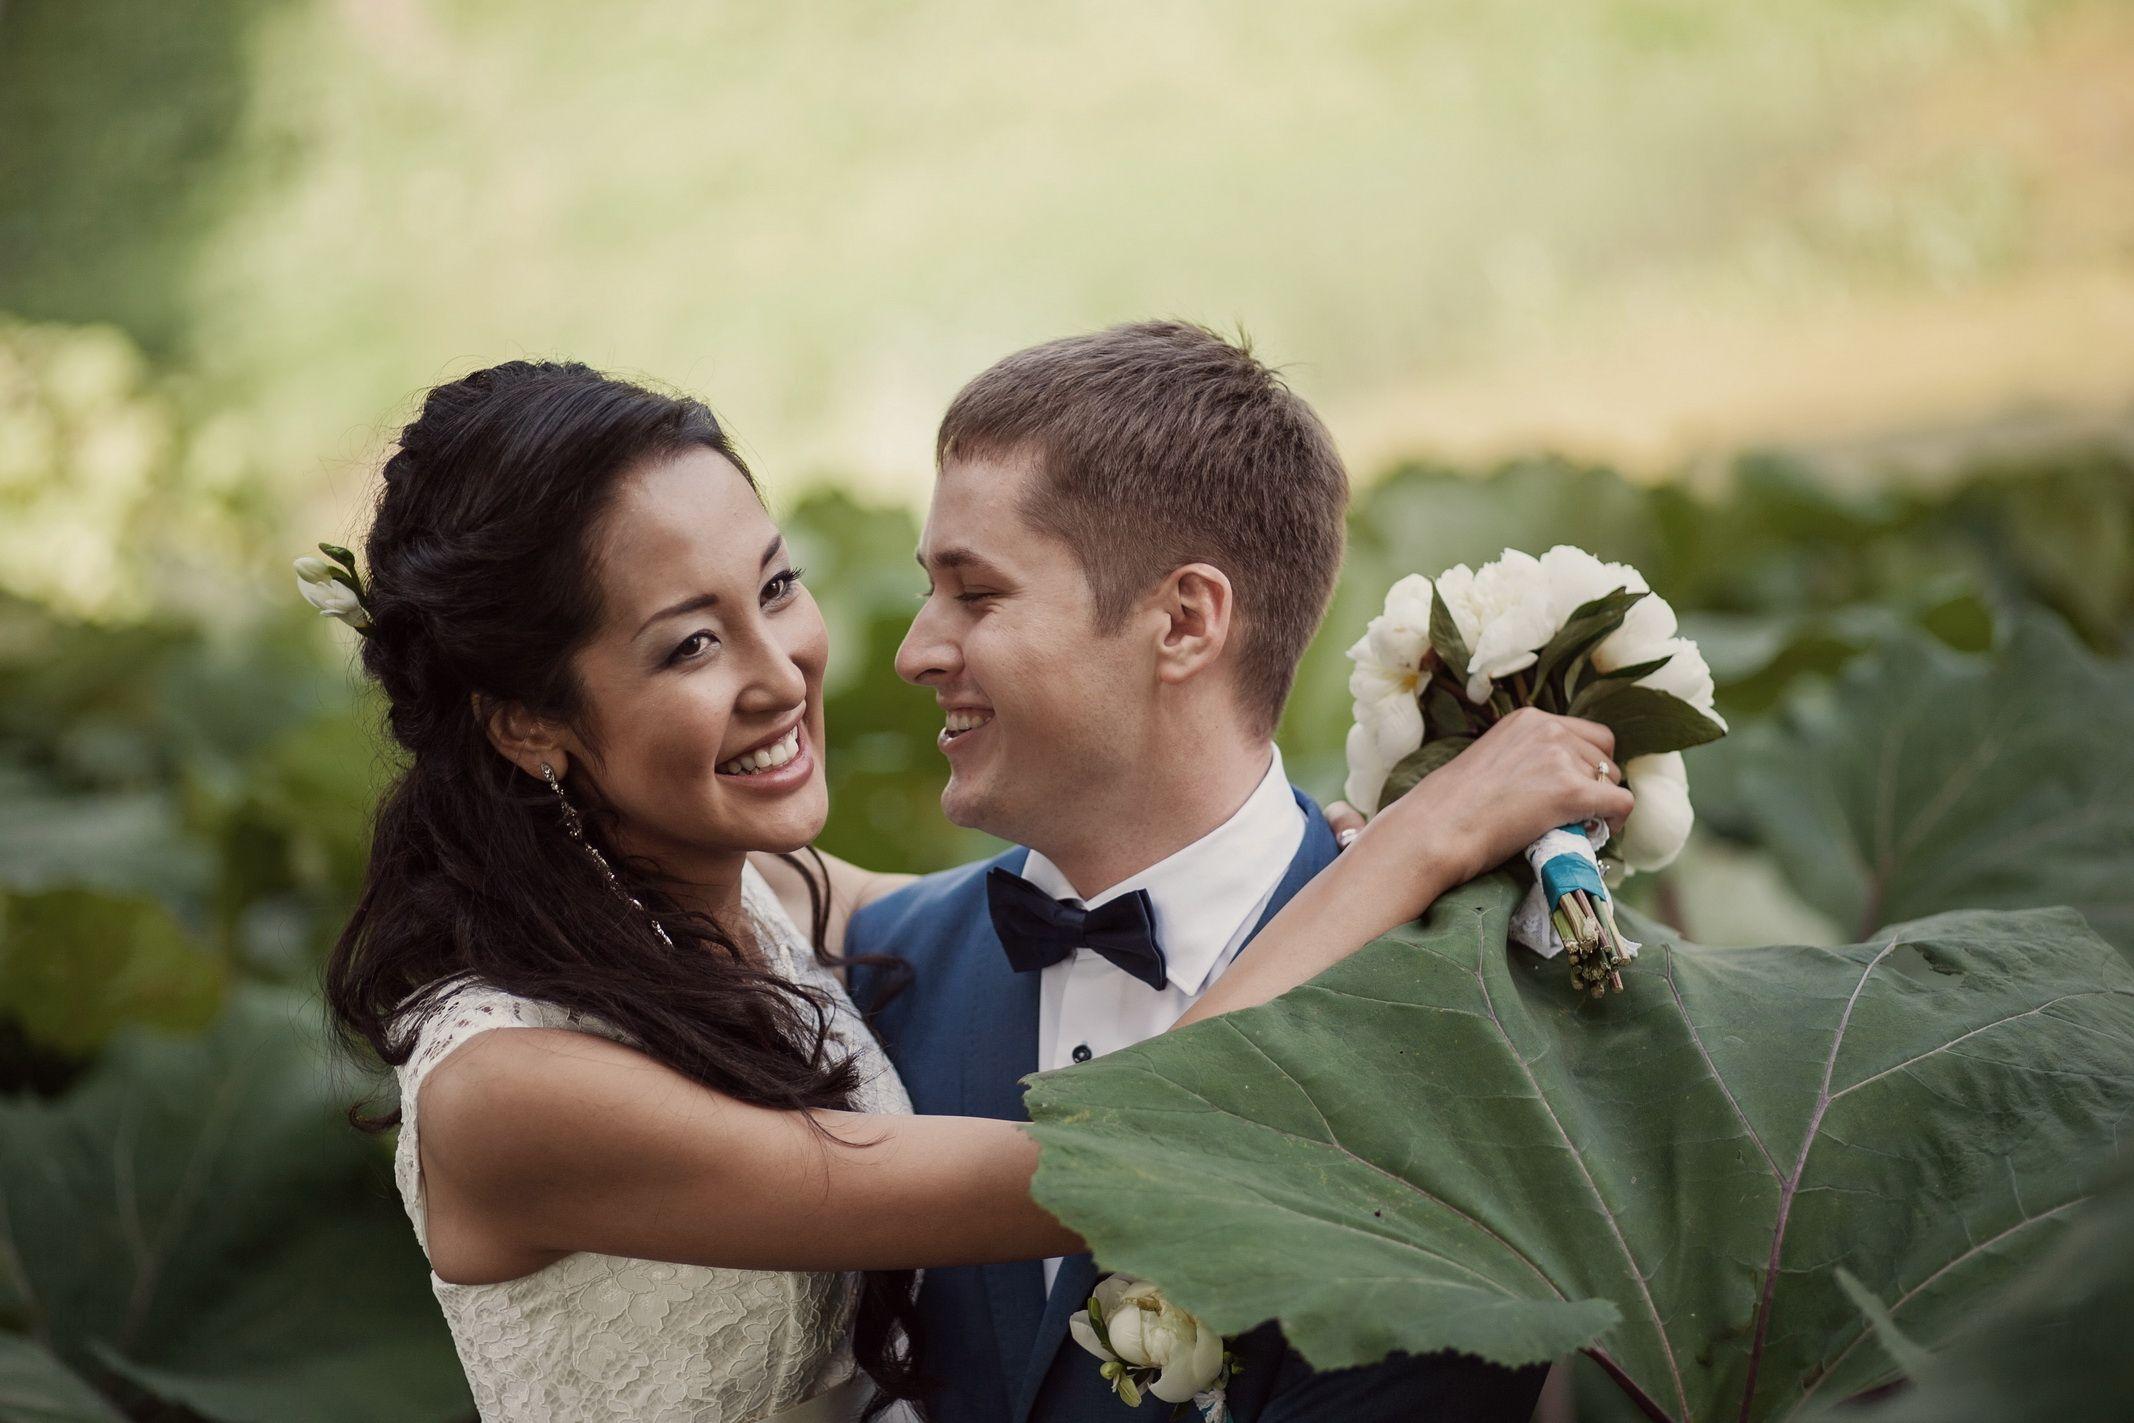 теги для свадебного фотографа